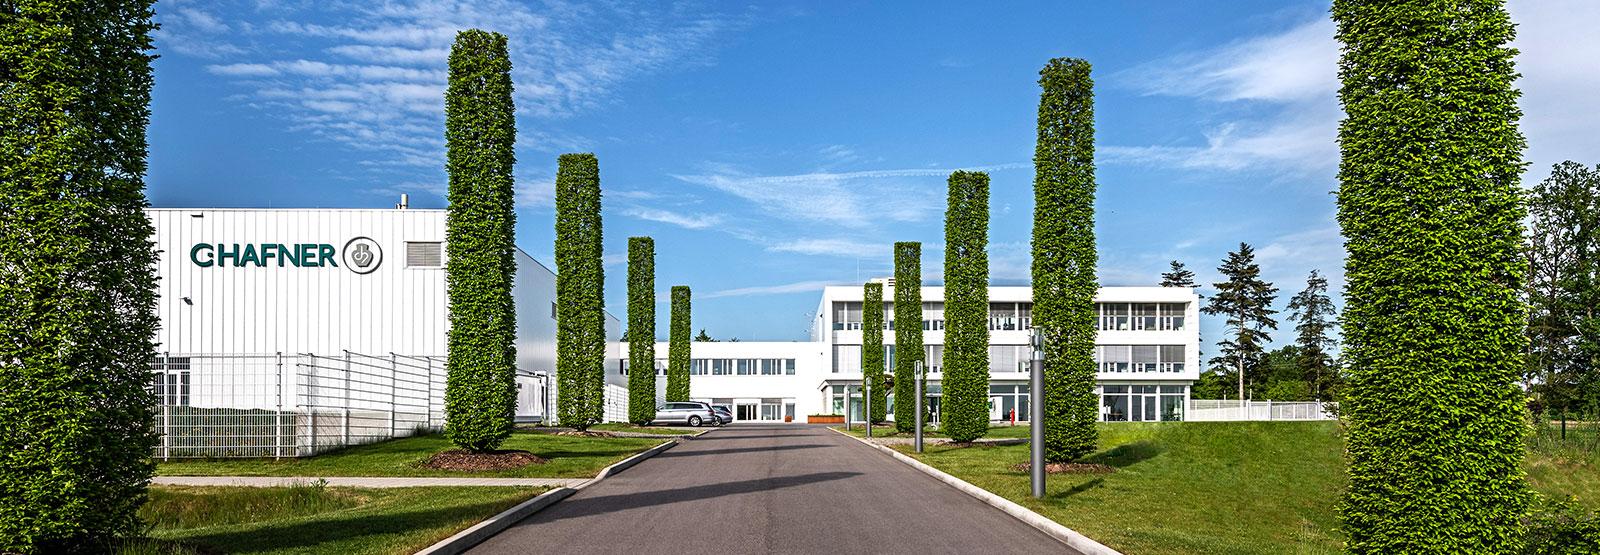 Firmengebäude der Firma C.Hafner